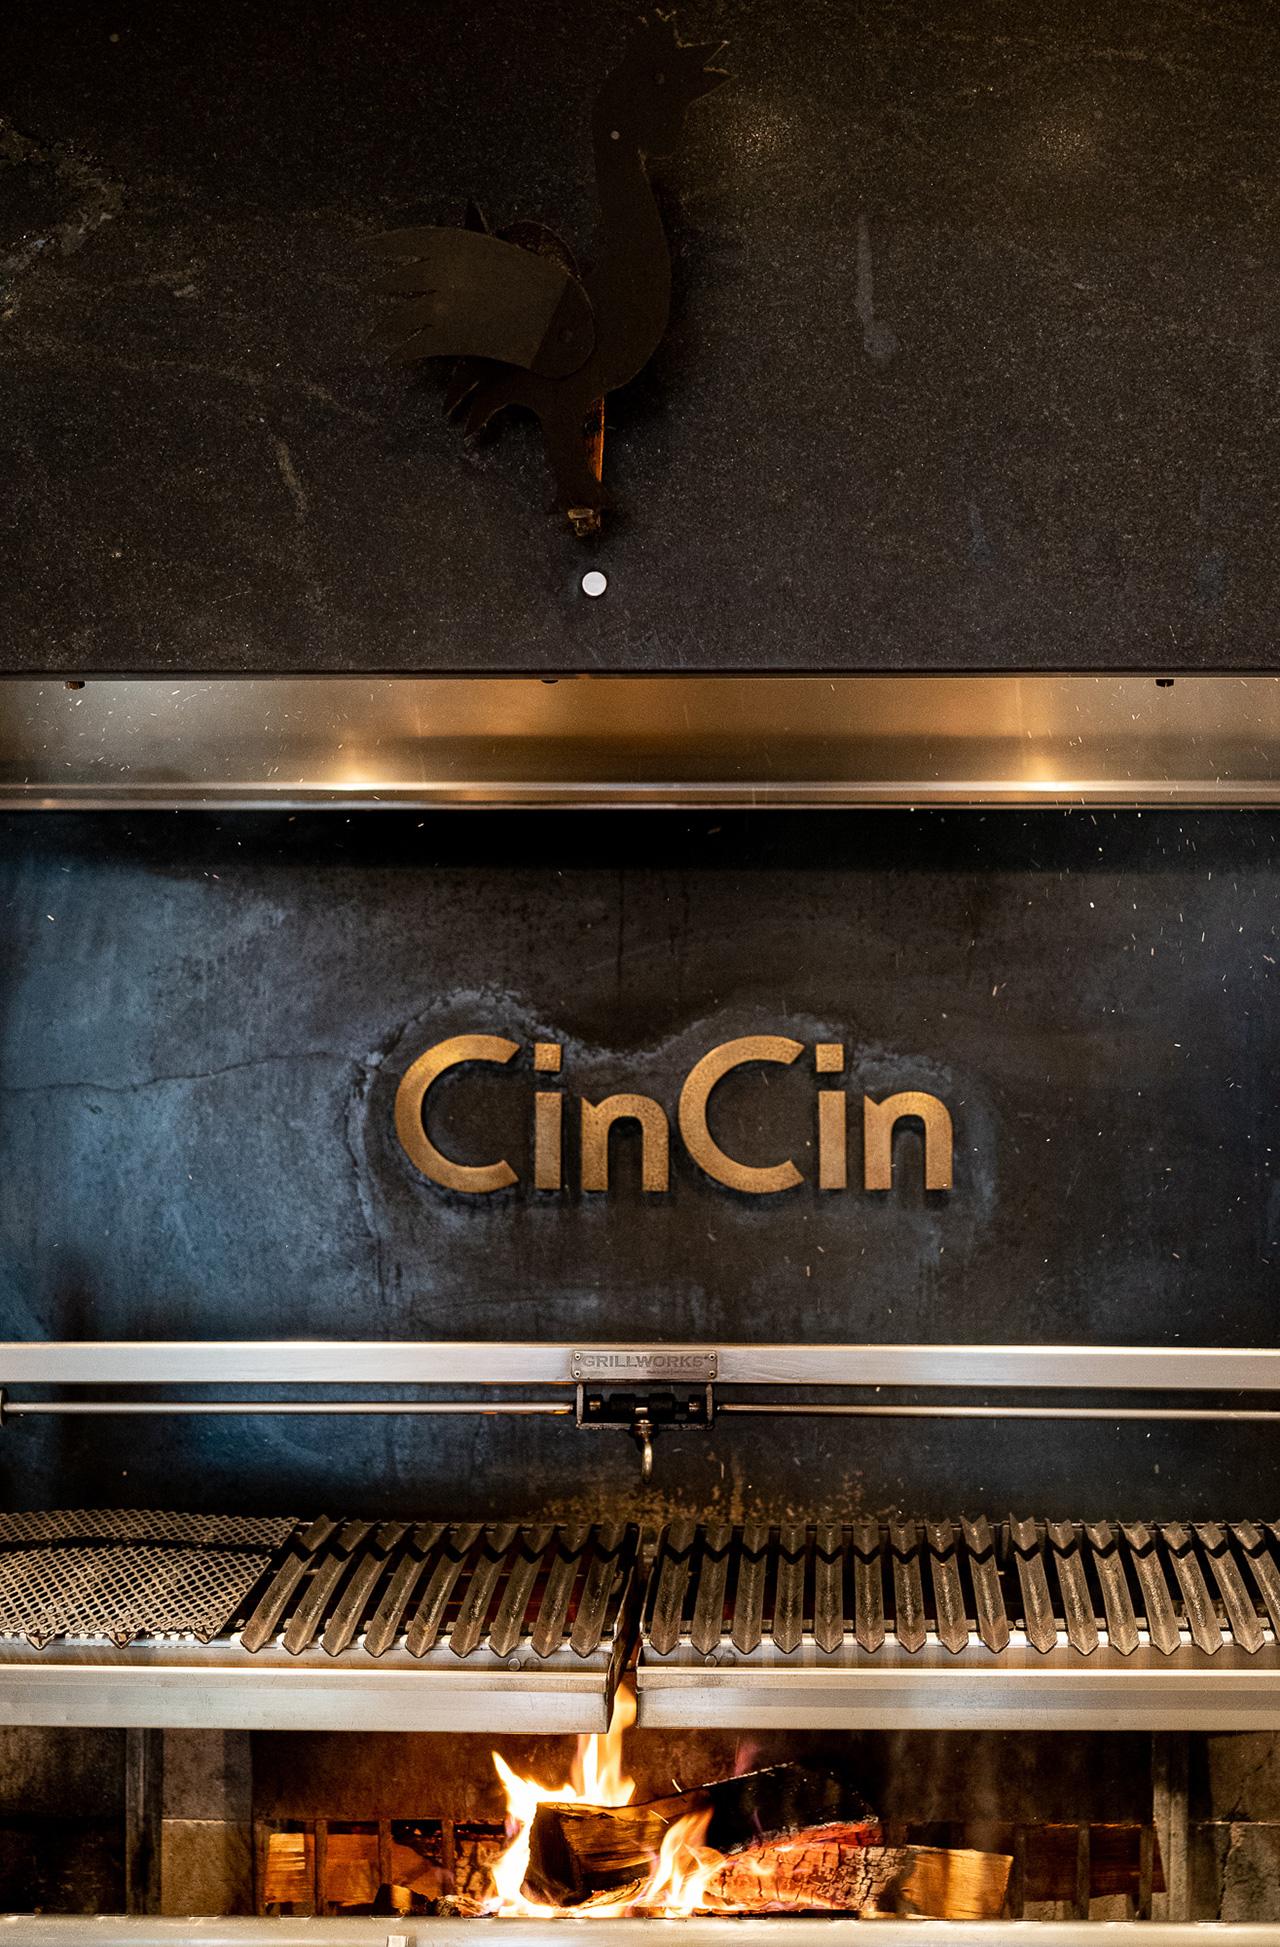 CinCin Ristorante by Florence Leung for Pendulum Magazine